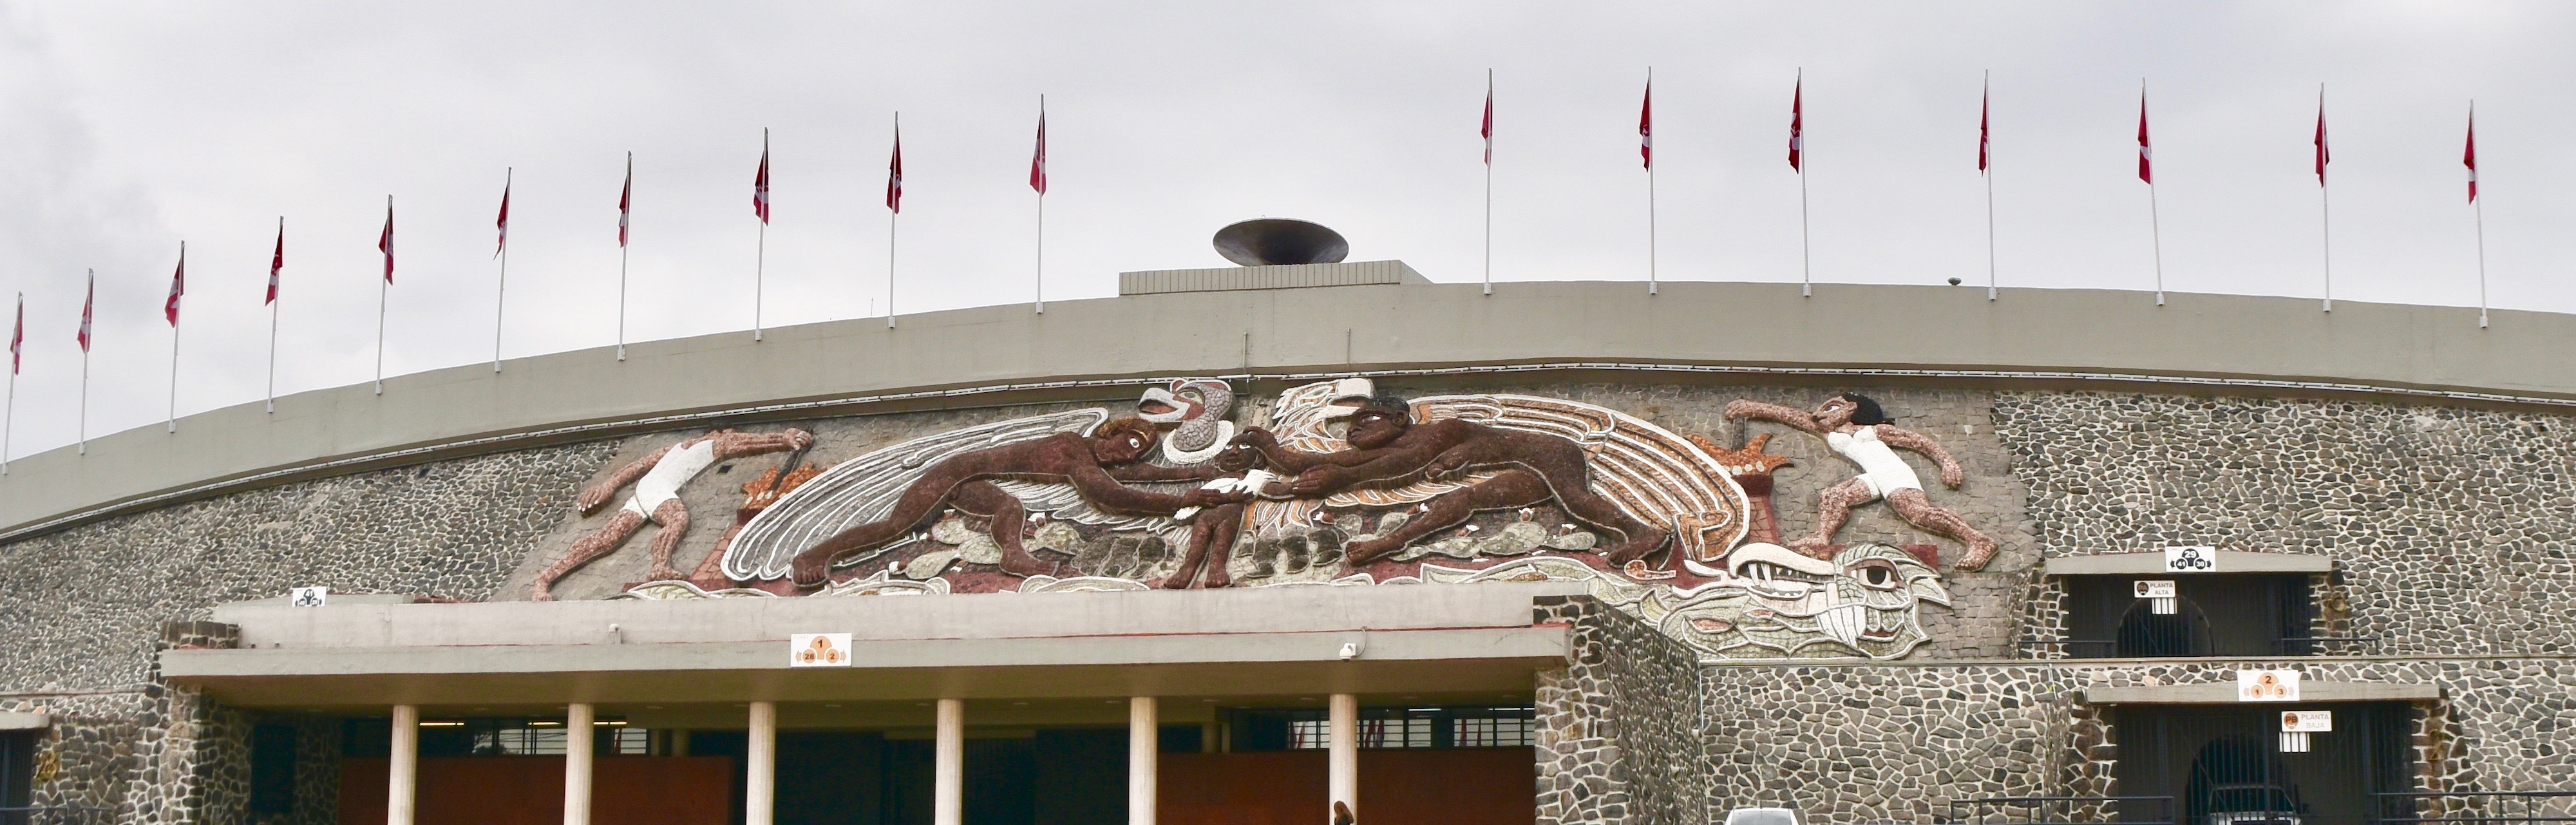 Olympic Stadium, Mexico City